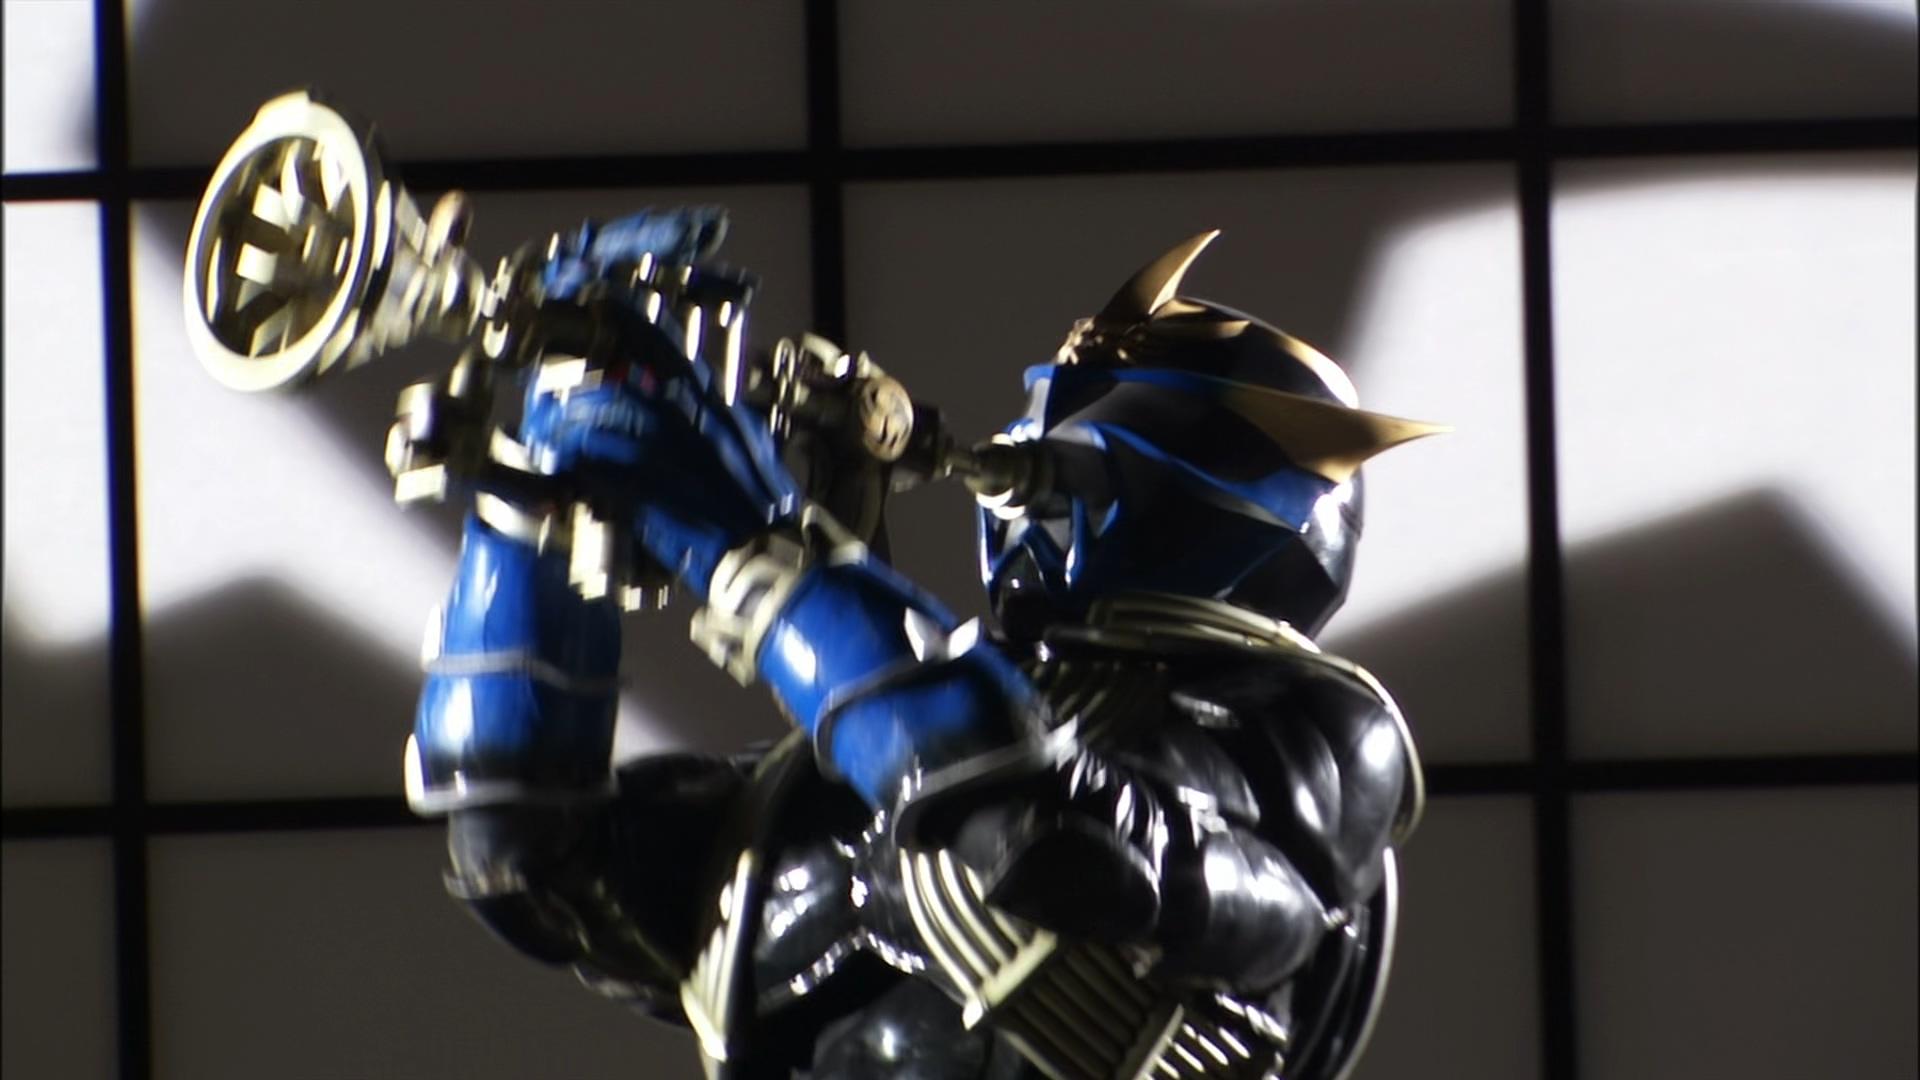 http://vignette1.wikia.nocookie.net/kamenrider/images/9/9f/Kamen_Rider_Amaki.jpg/revision/latest?cb=20100131215015